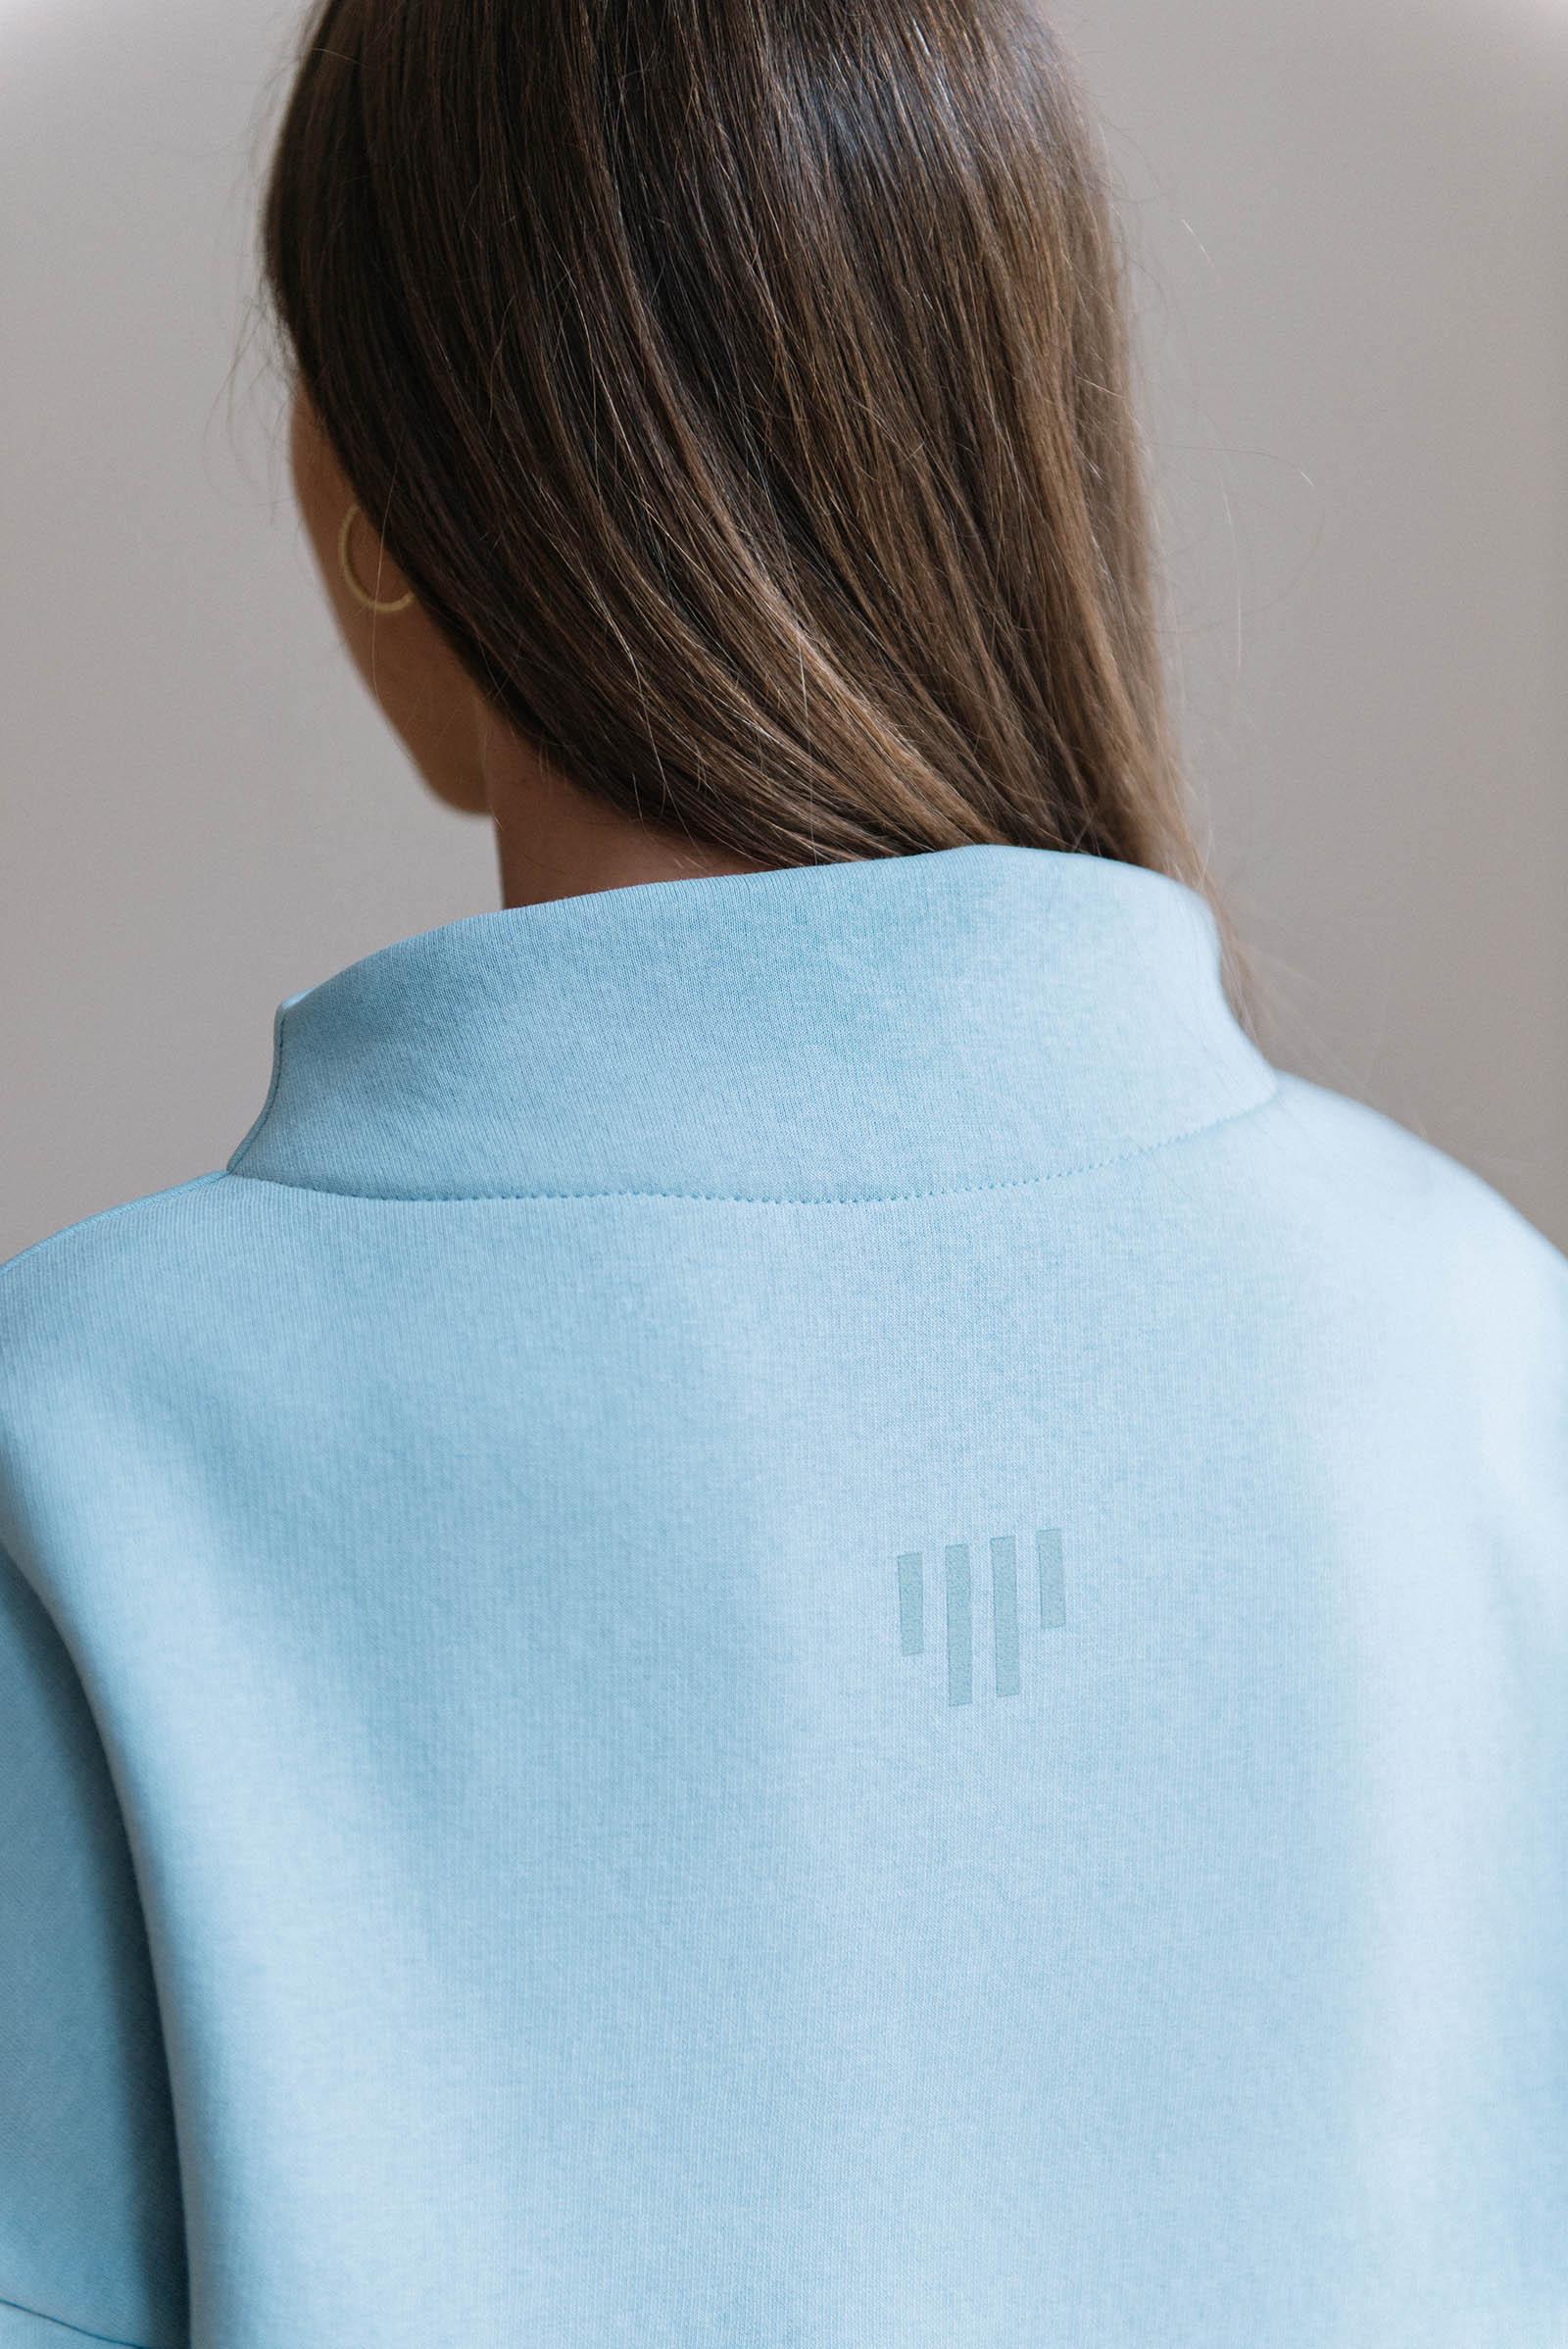 women sweatshirt and sweaters Berta light blue